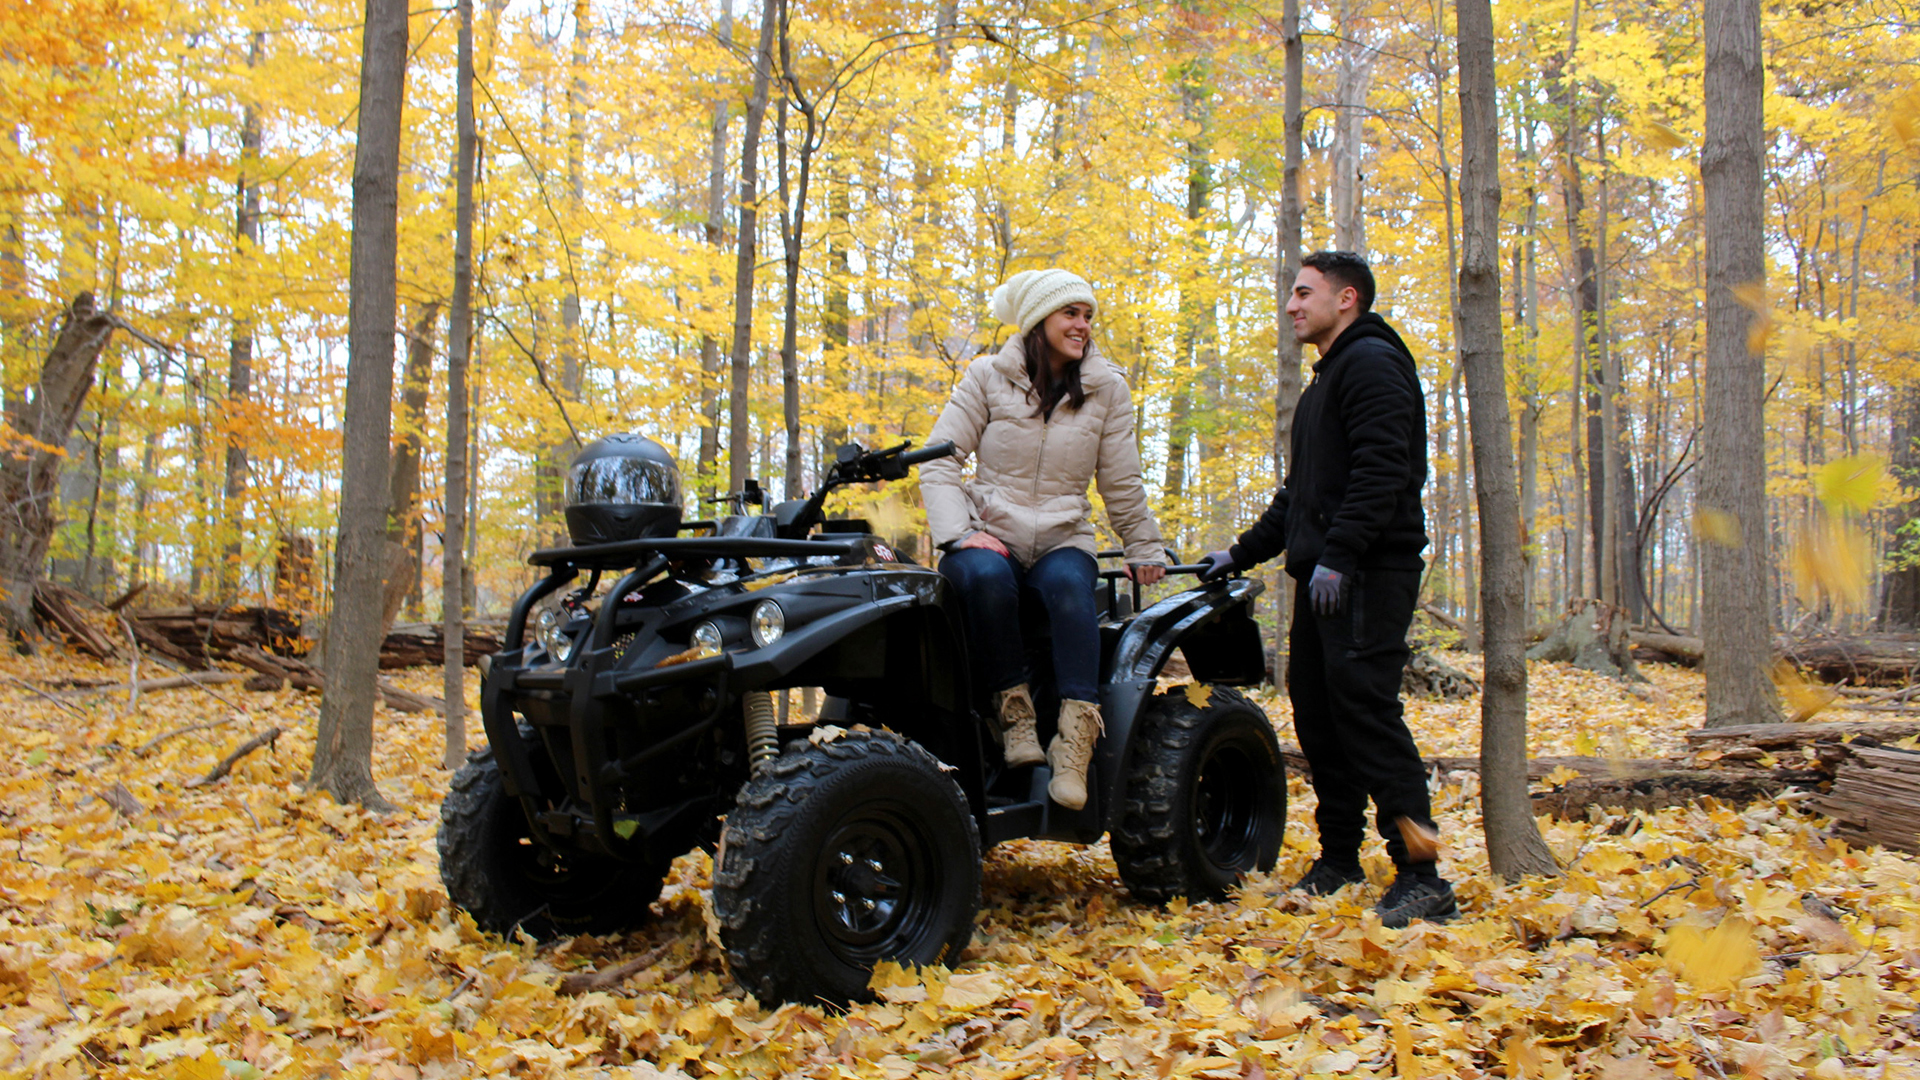 DRR Stealth Electric ATV 6.jpg